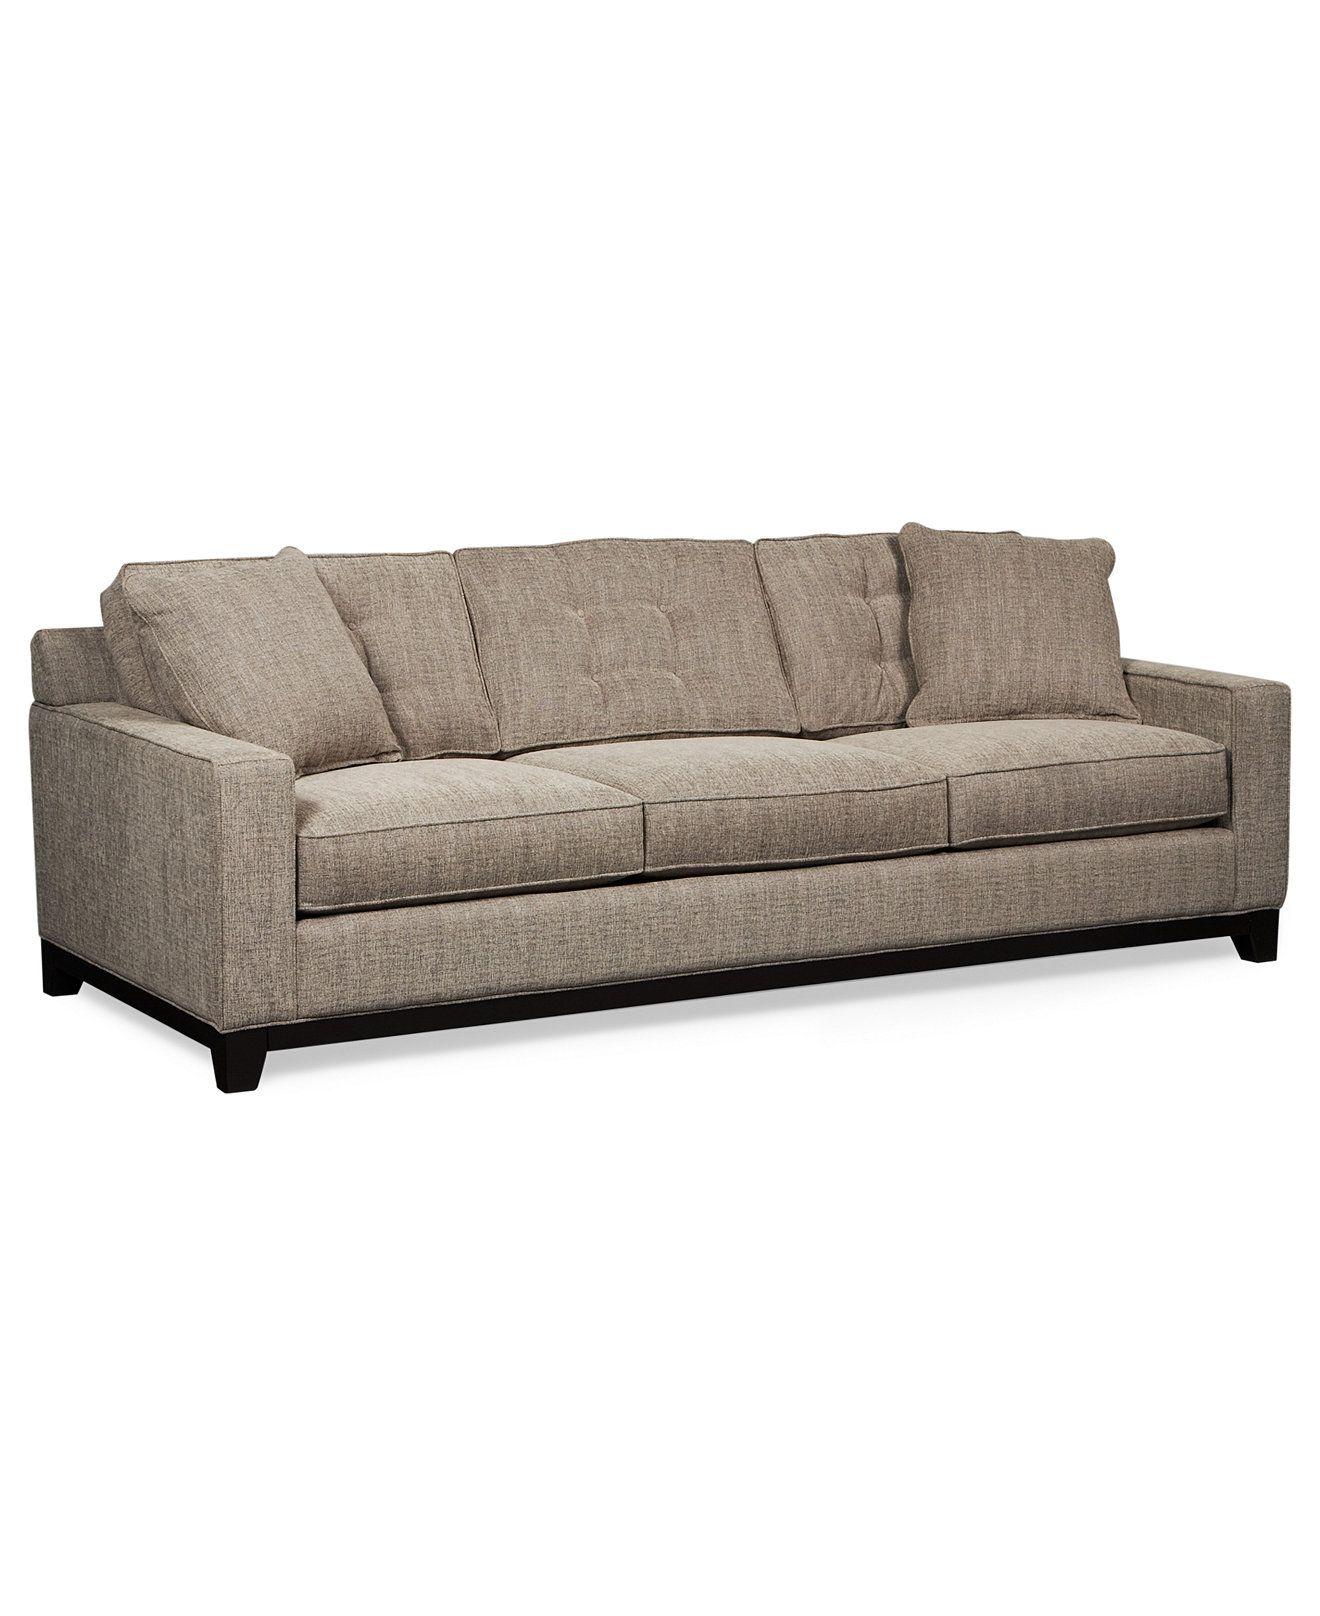 3 A Rudin 2859 Sofa Custom Length Of 110 Approximately 8000